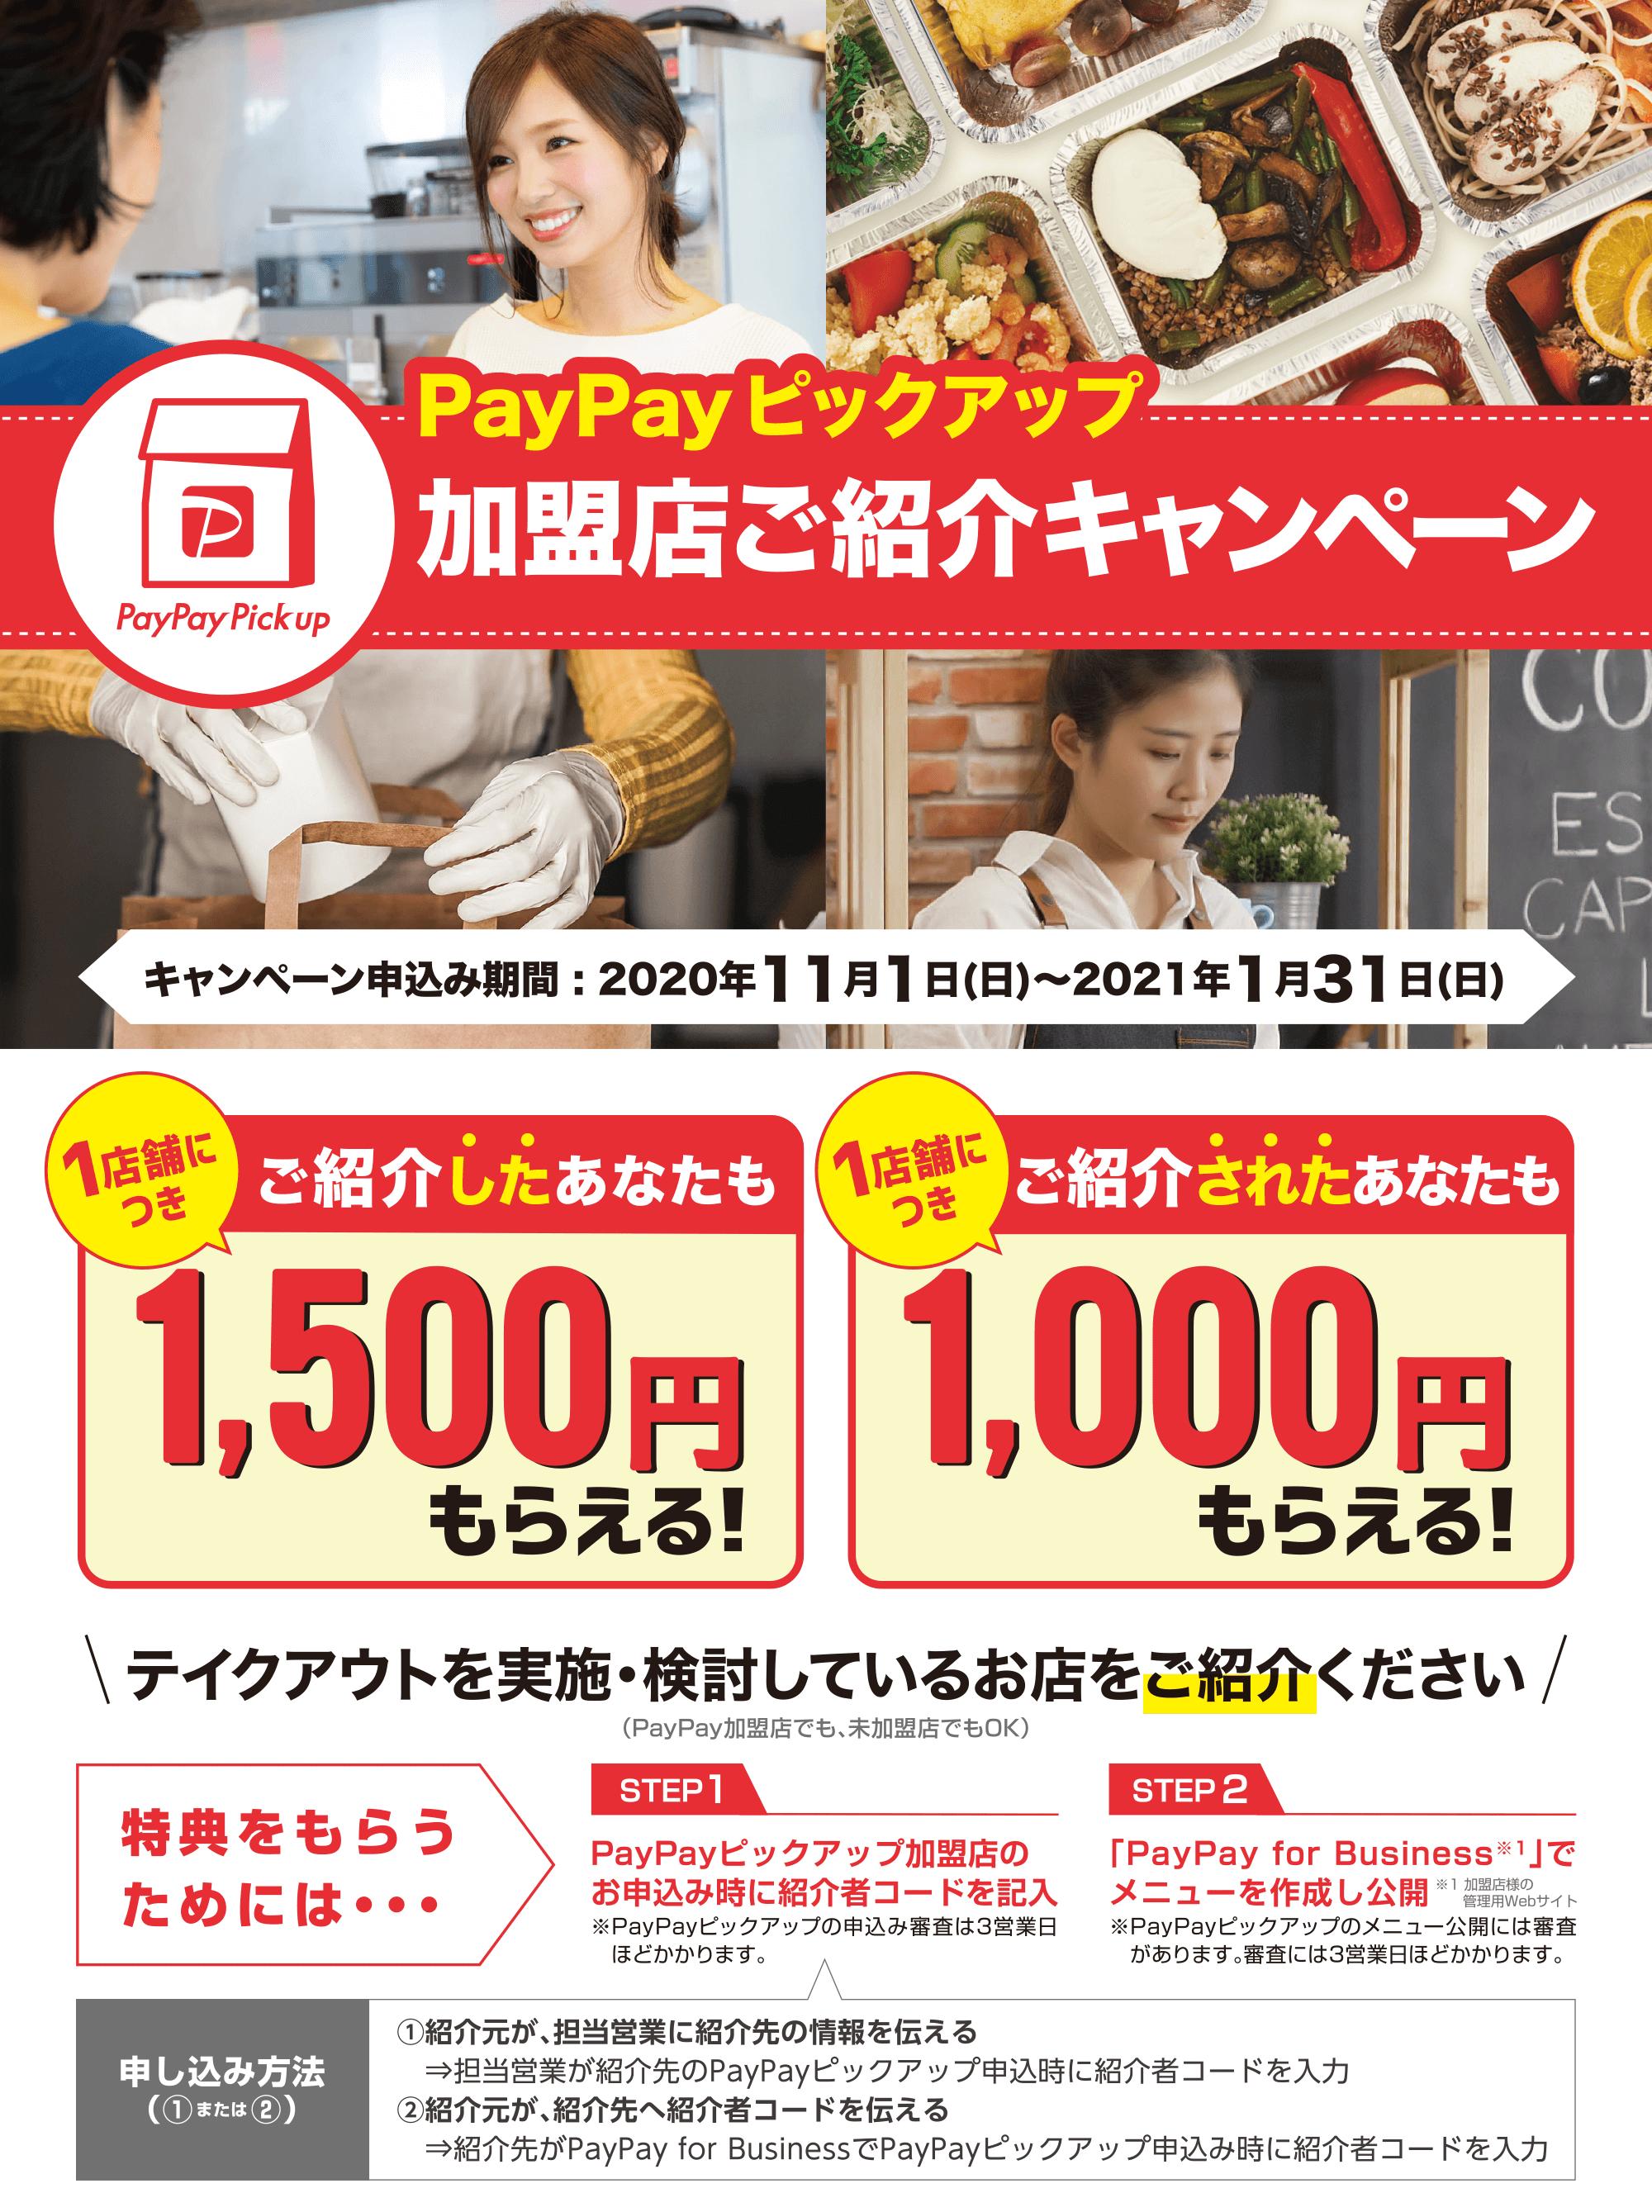 paypayピックアップ加盟店ご紹介キャンペーン